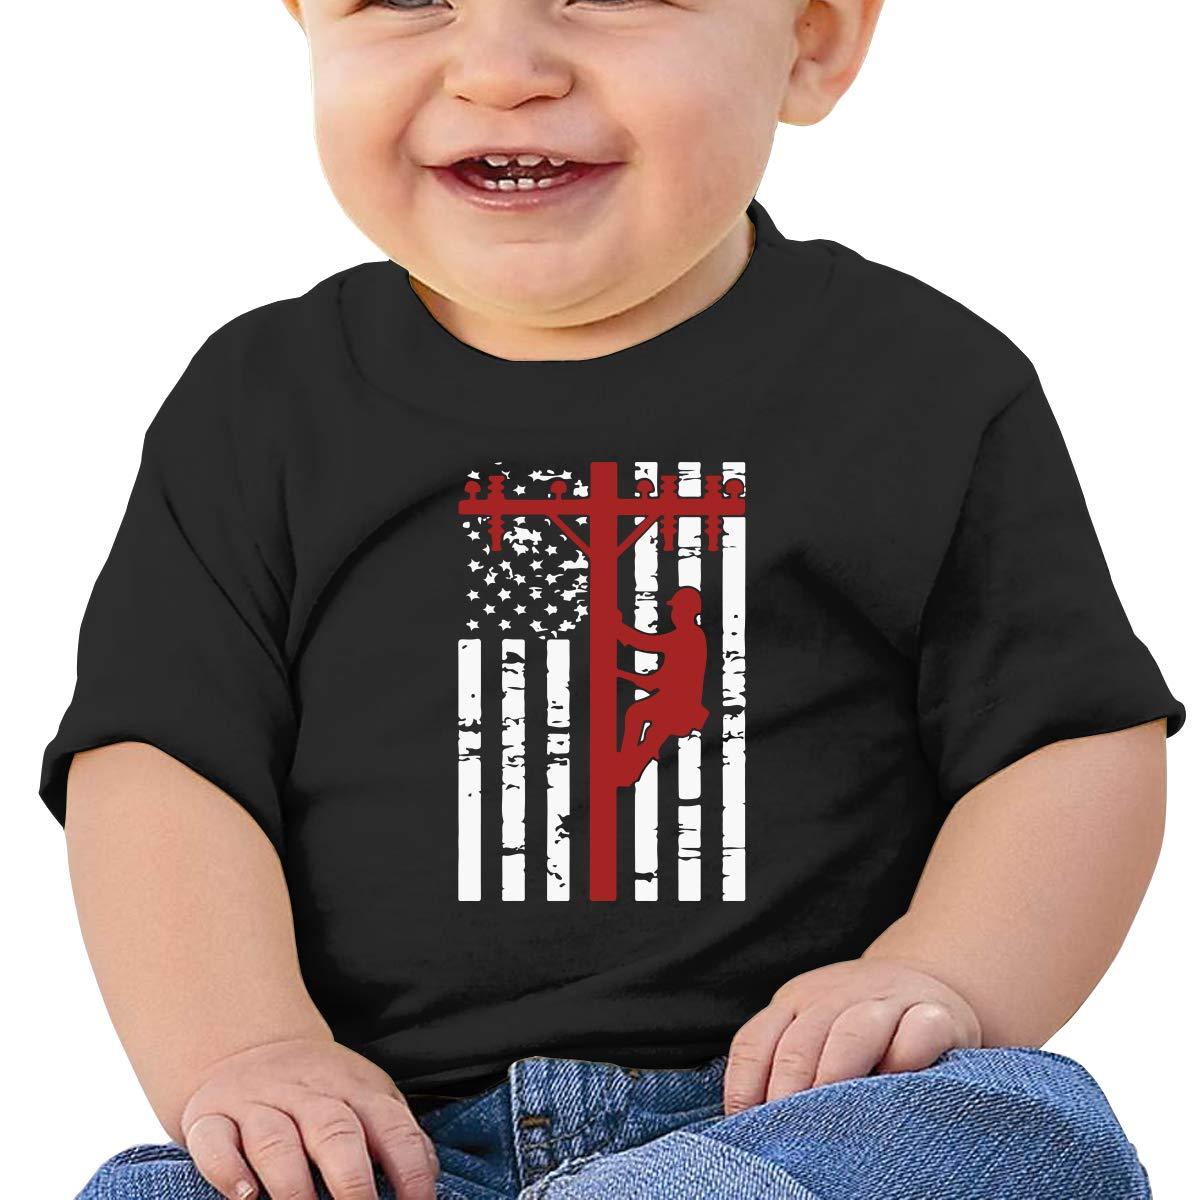 ZUGFGF-S3 American Lineman Flag Baby Boy Girl Newborn Short Sleeve T Shirts 6-24 Month Cotton Tops